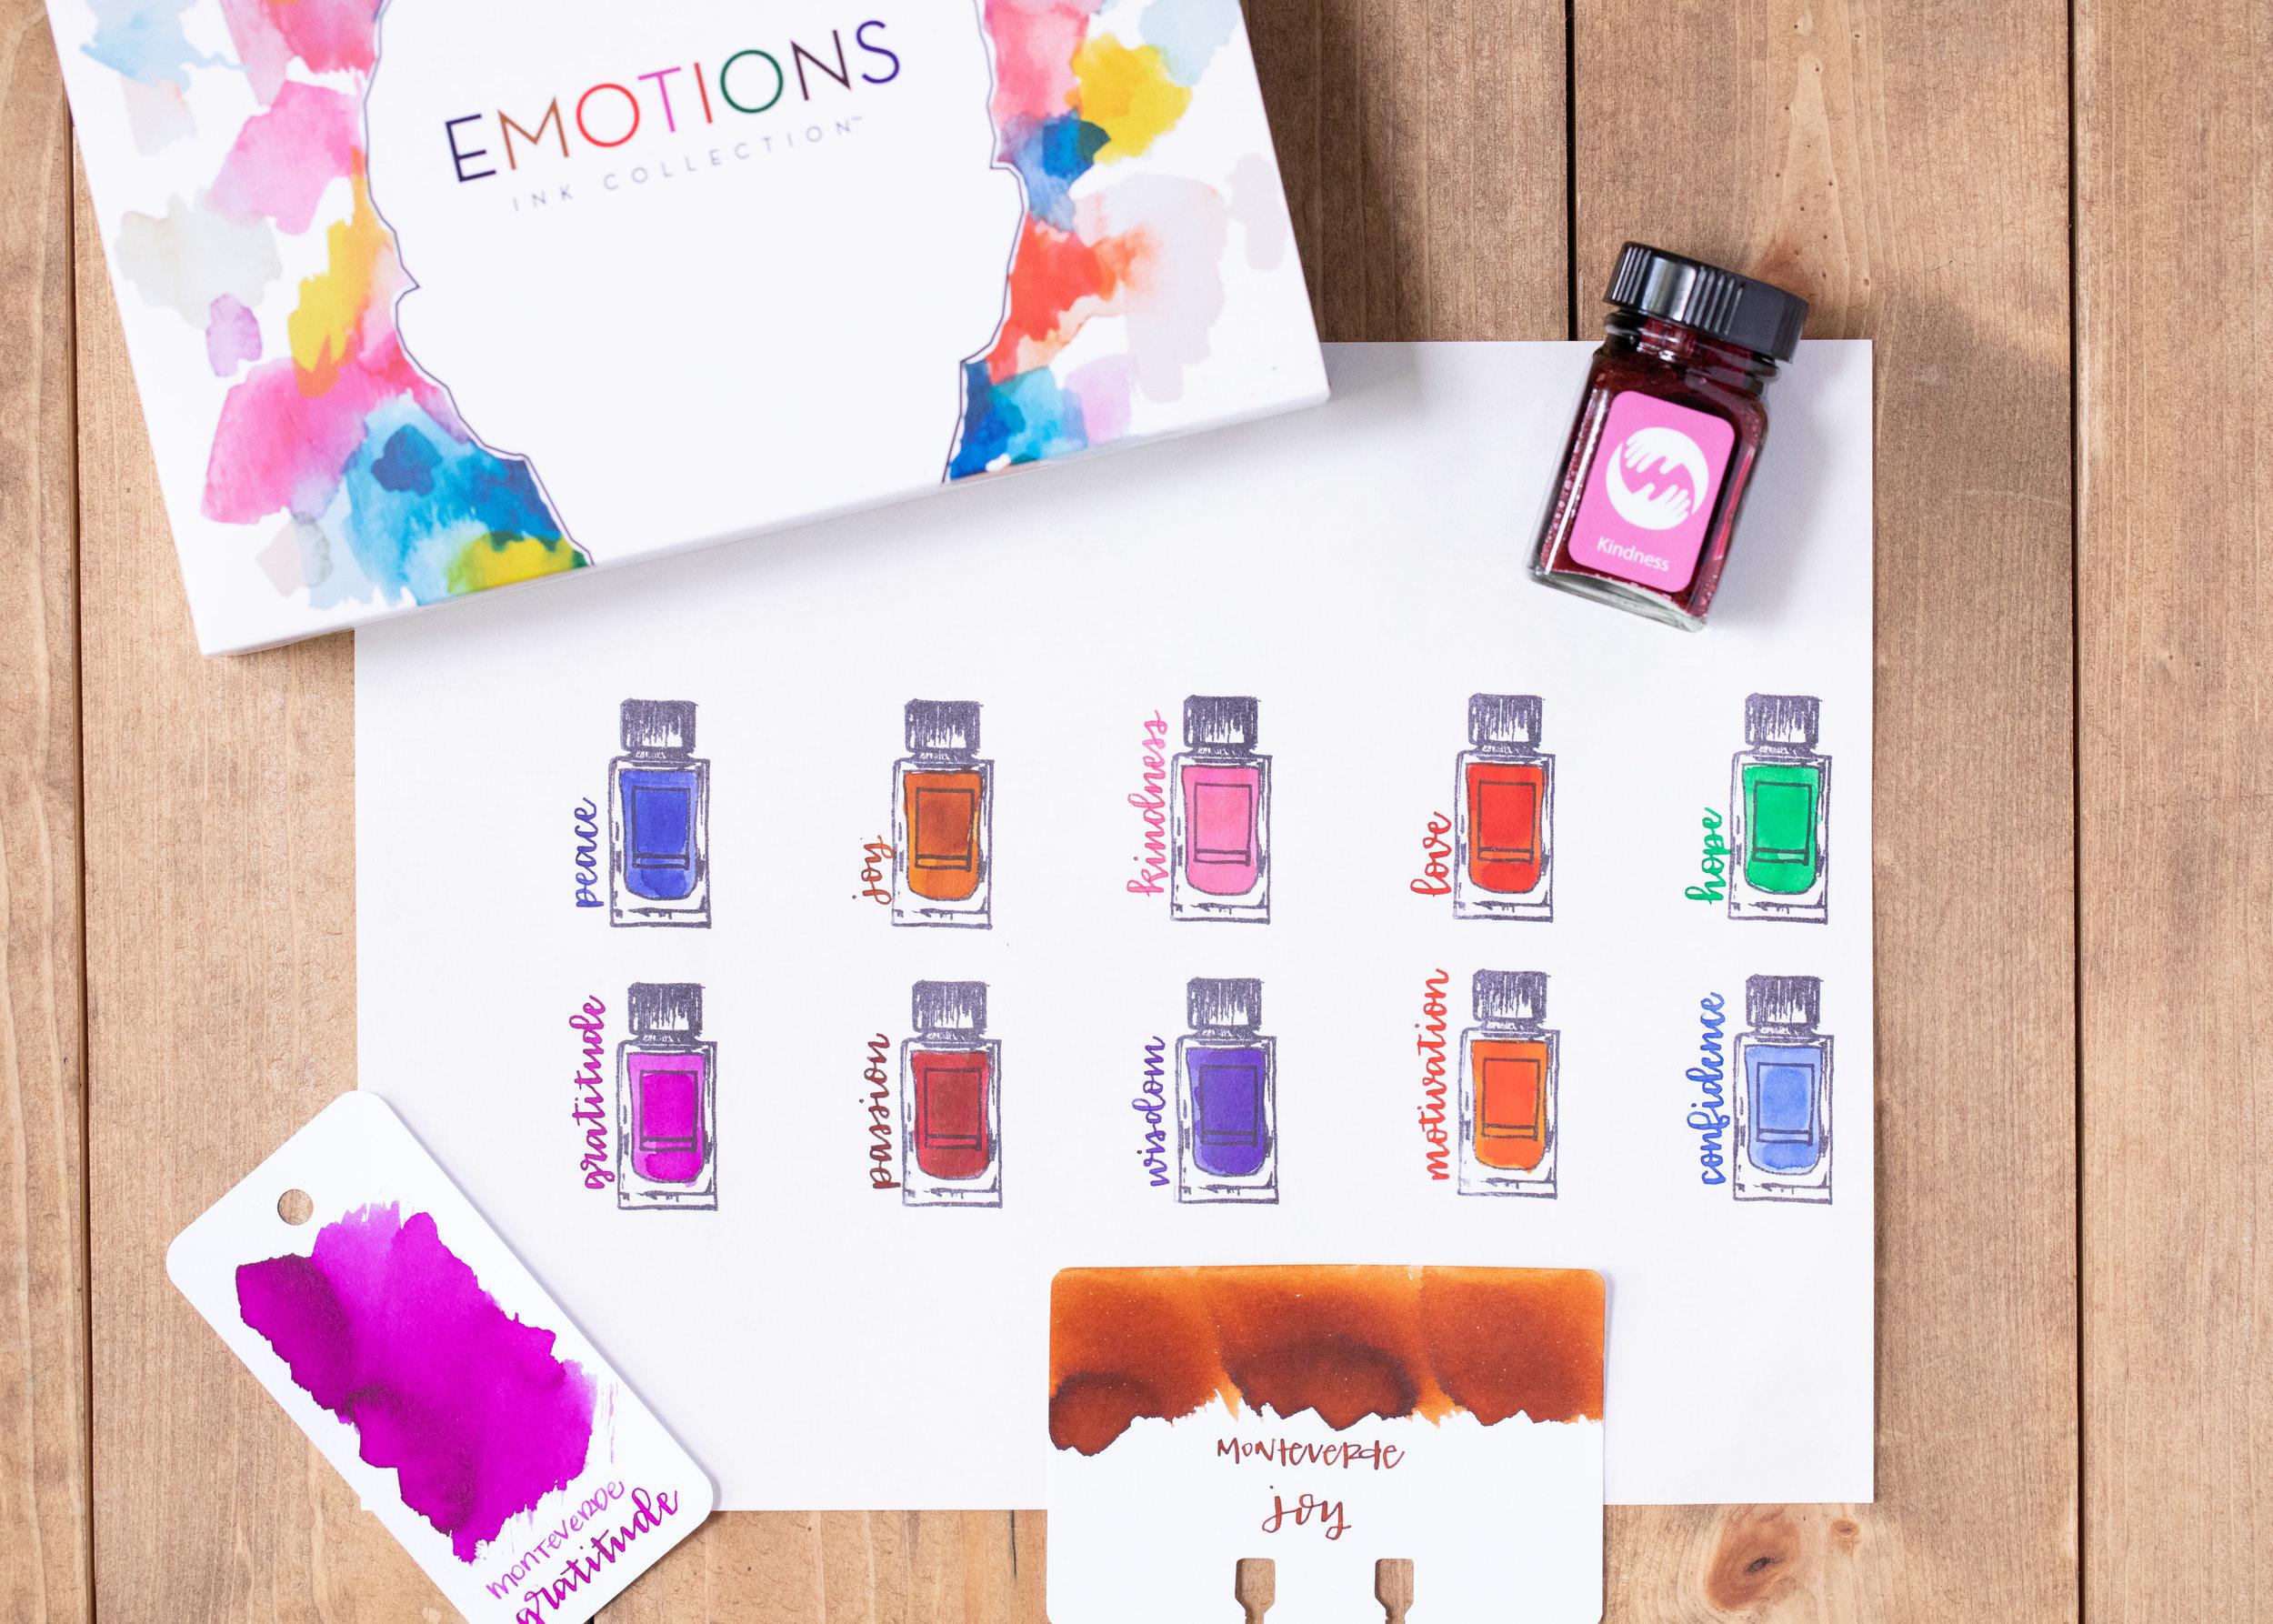 mv-emotions-2.jpg